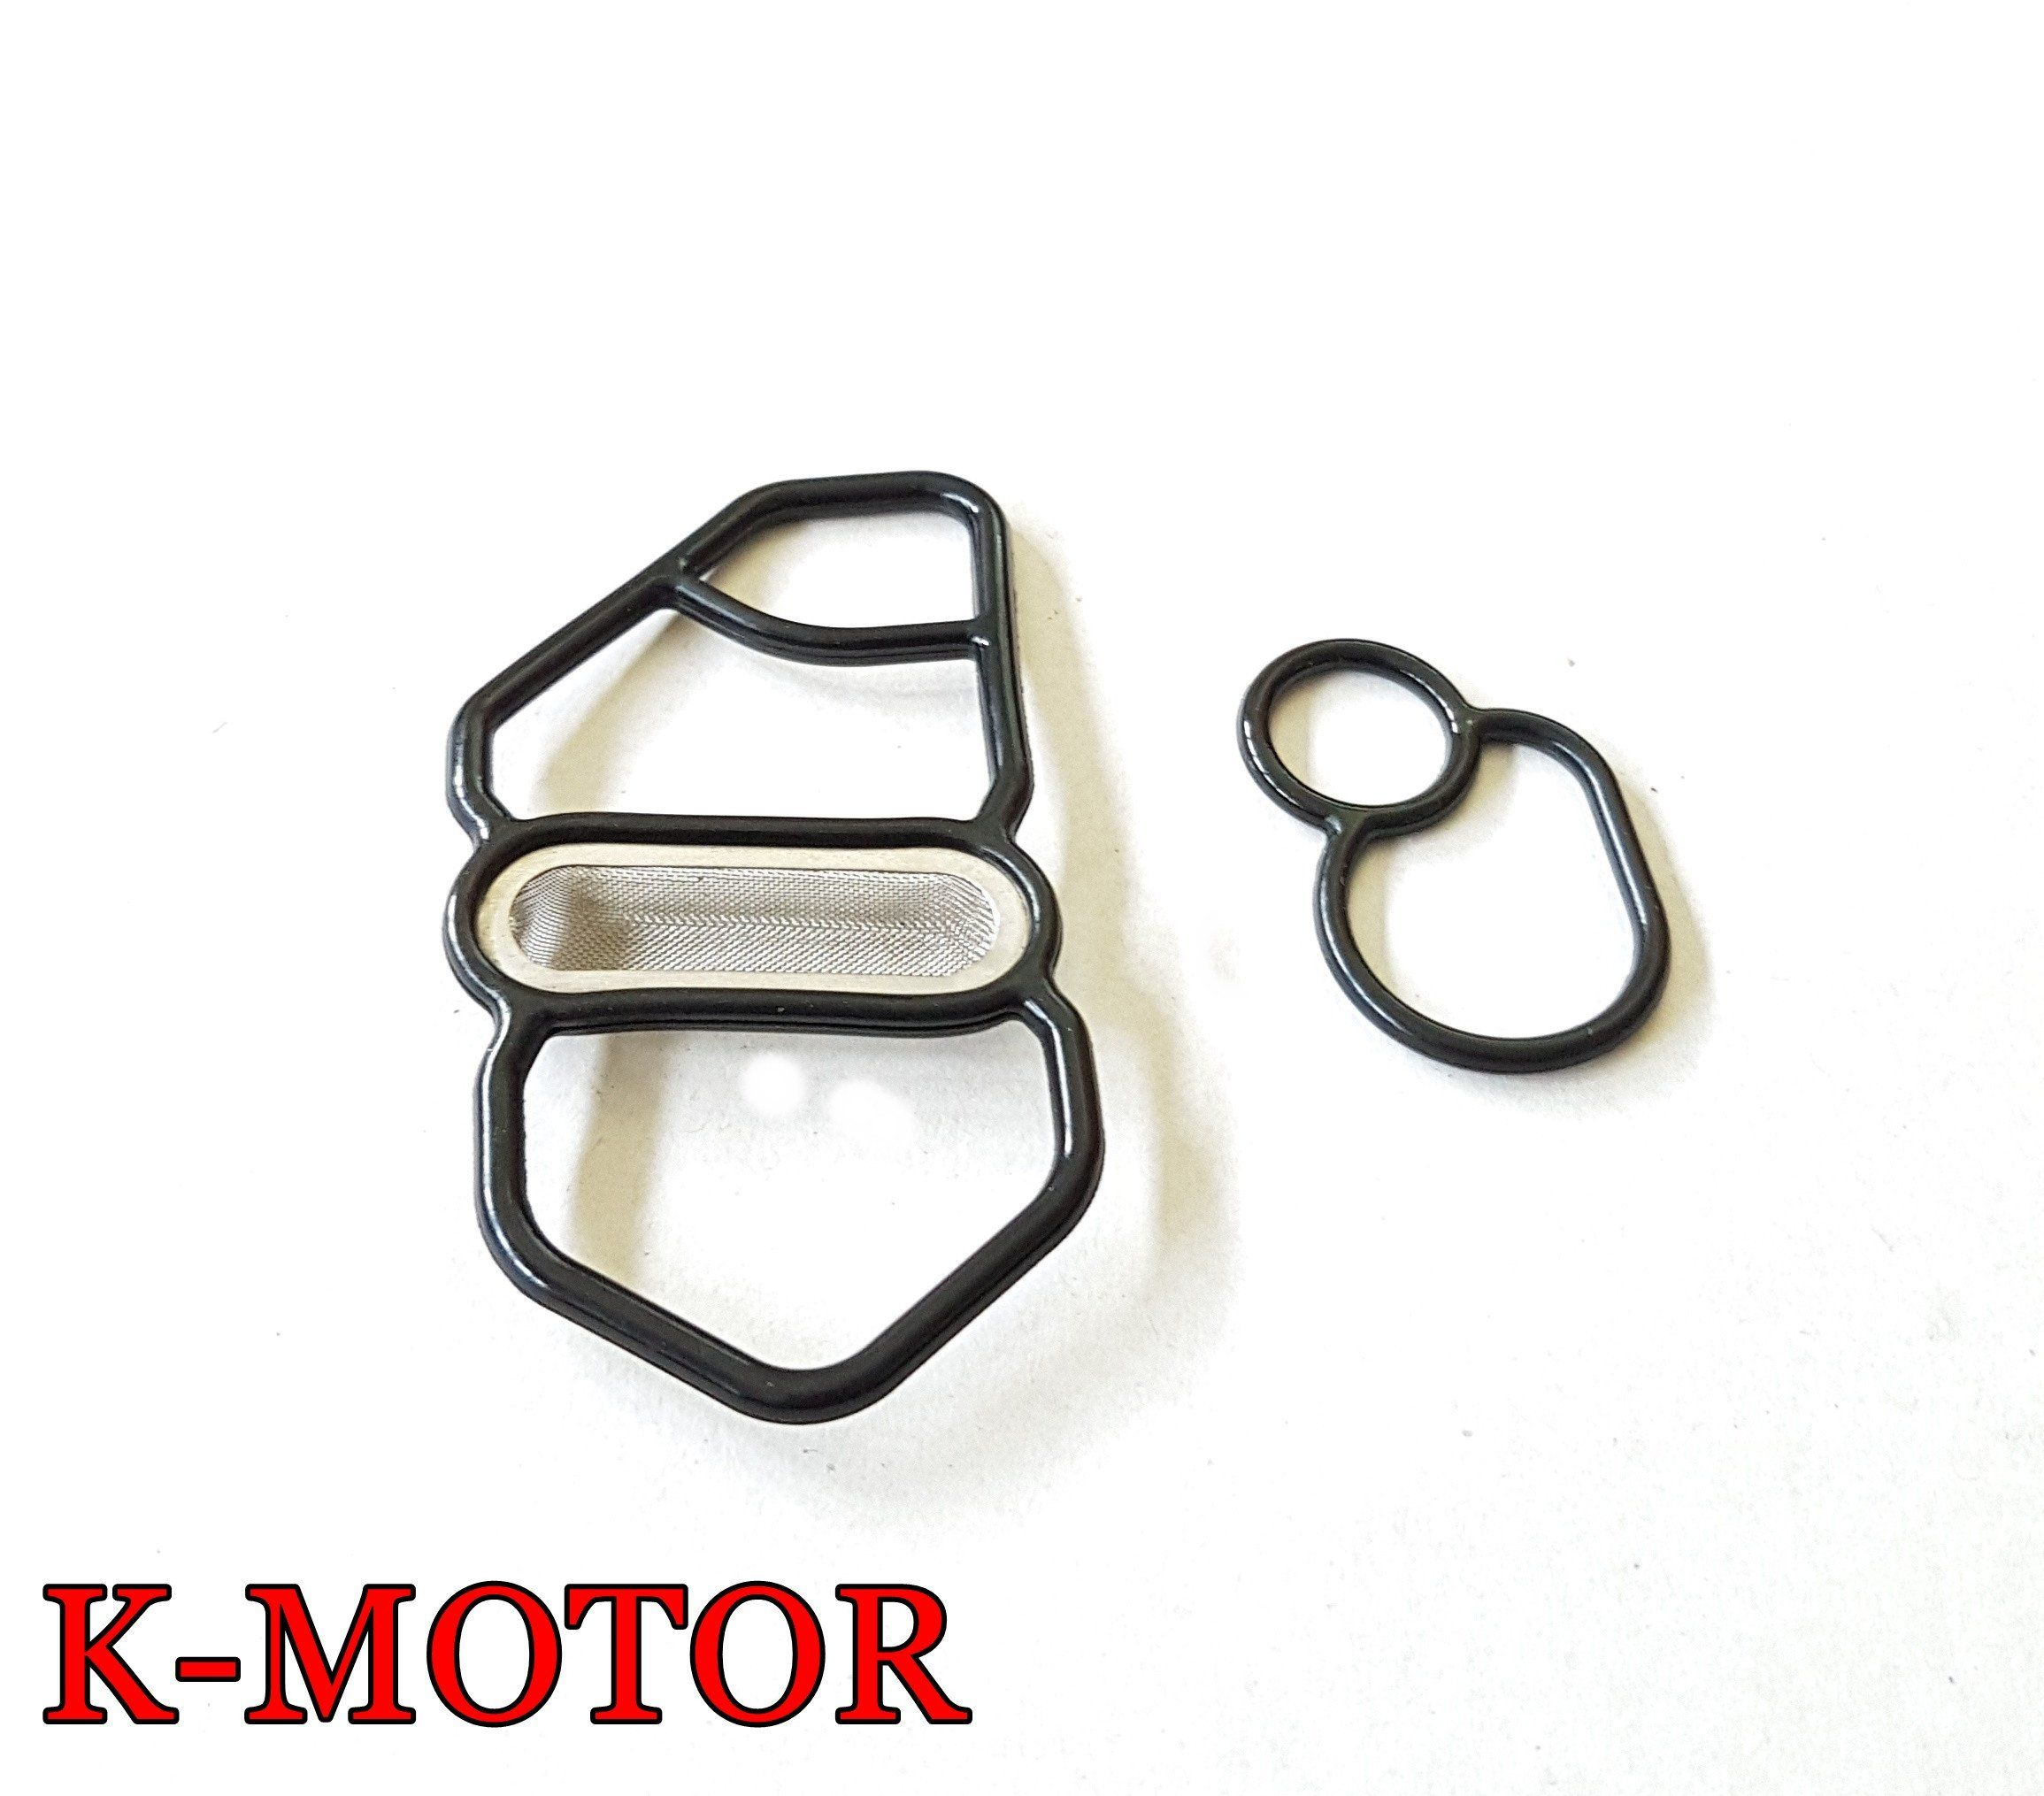 K-MOTOR-VTEC-SPOOL-VALVE-SOLENOID-GASKET-D15-D16-B16-B18C-B20-GSR-TYPE-R-SI